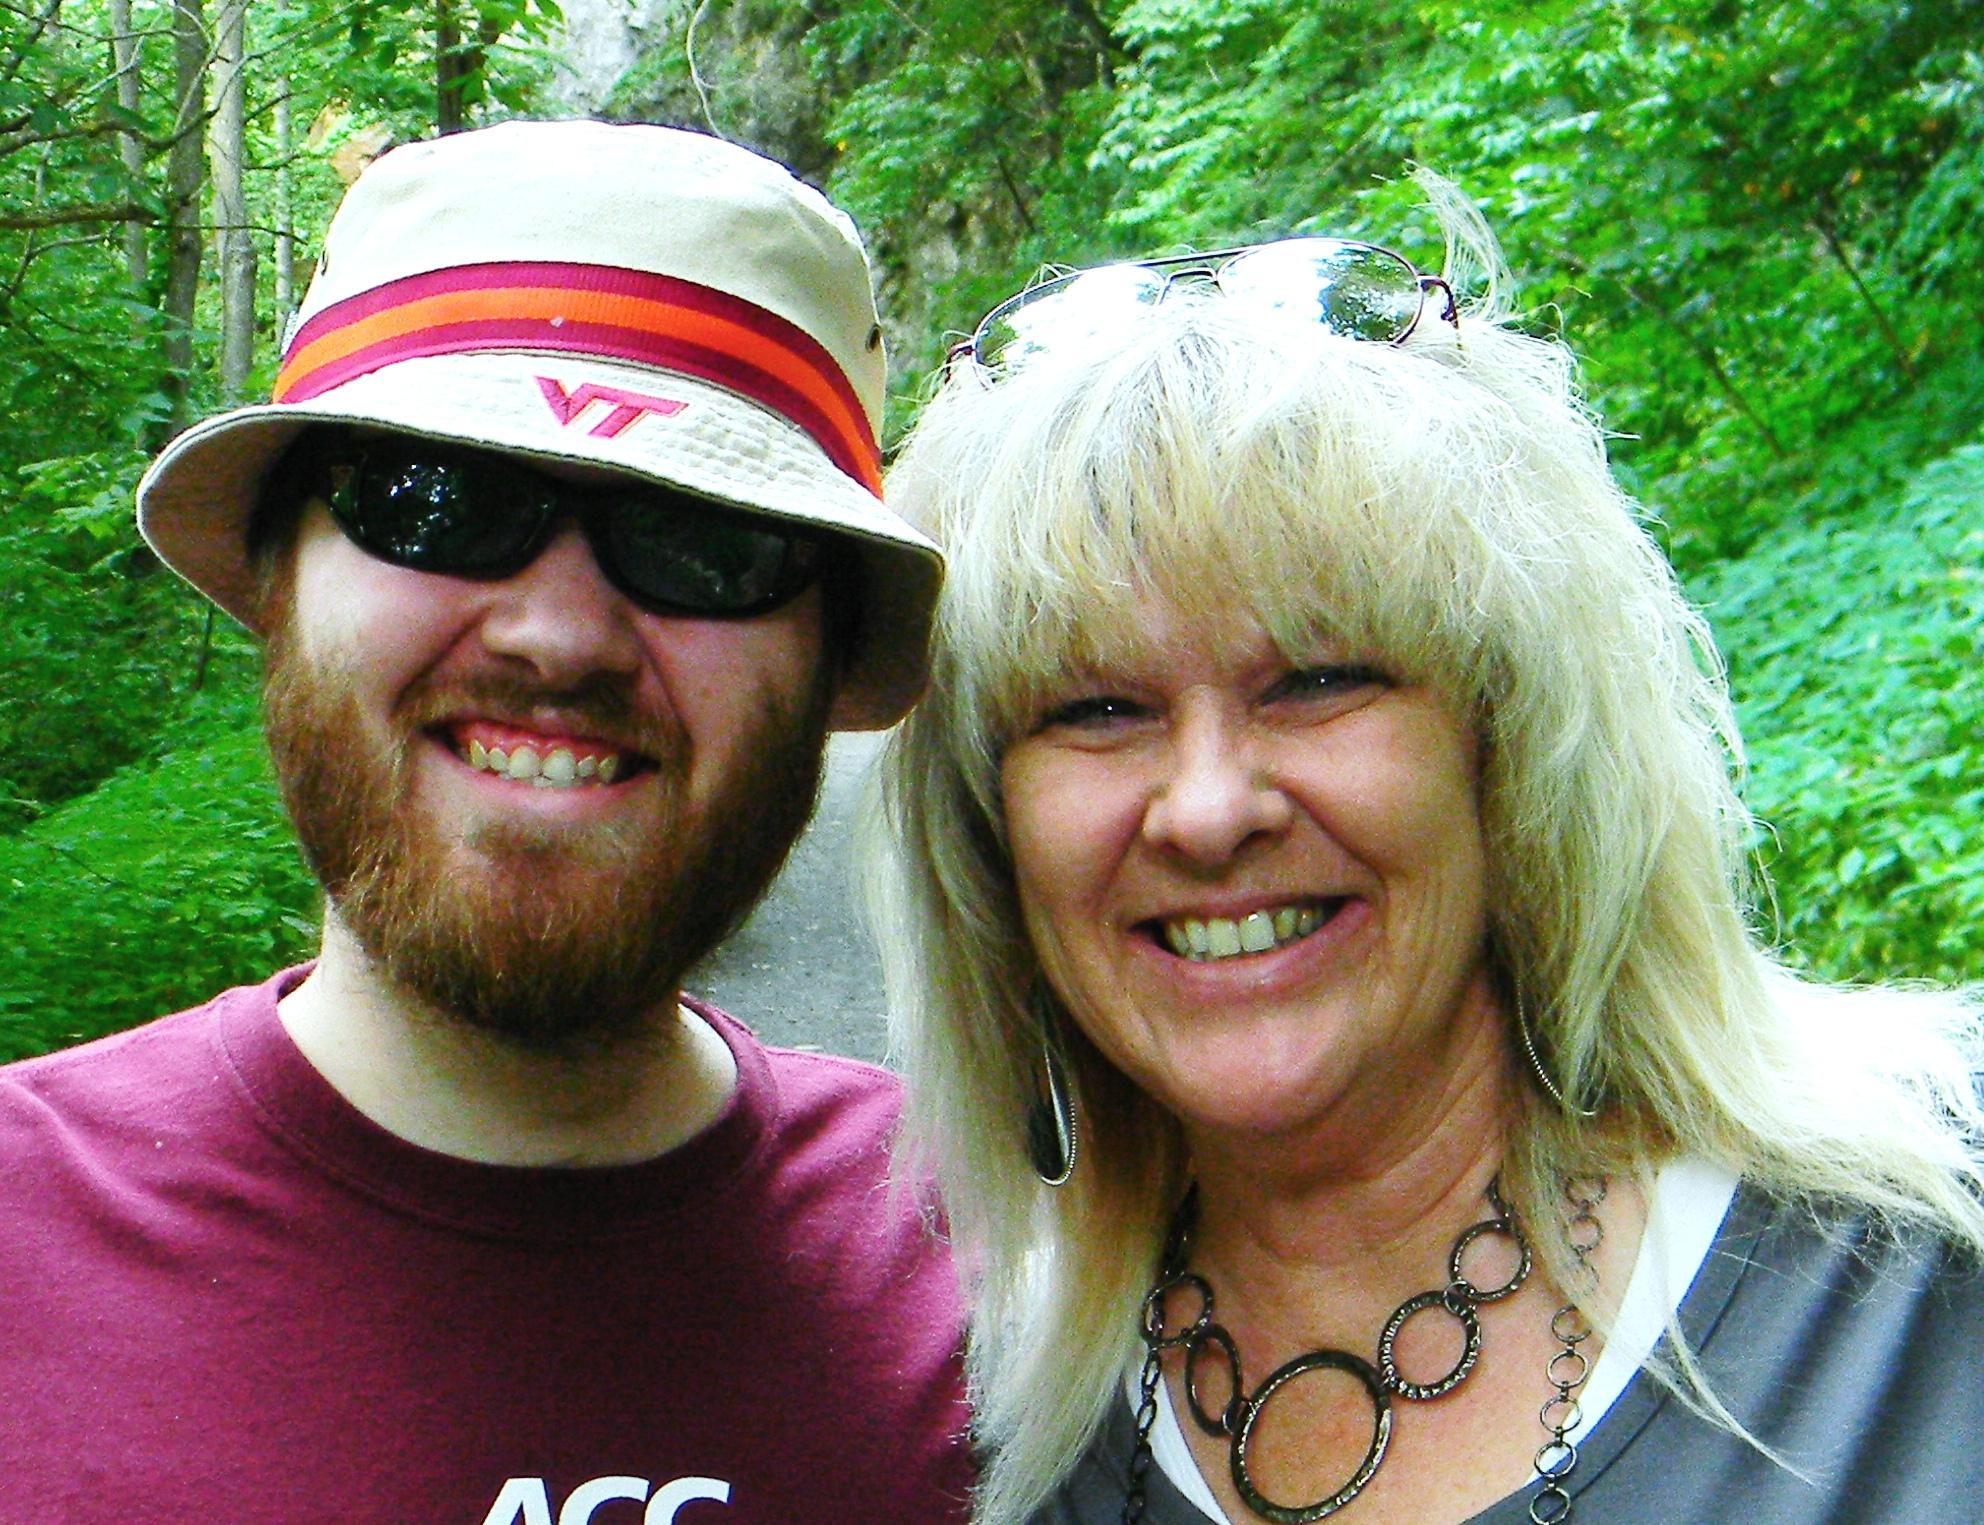 Liz Becker, author of 'Autism and the World According to Matt' Part 2